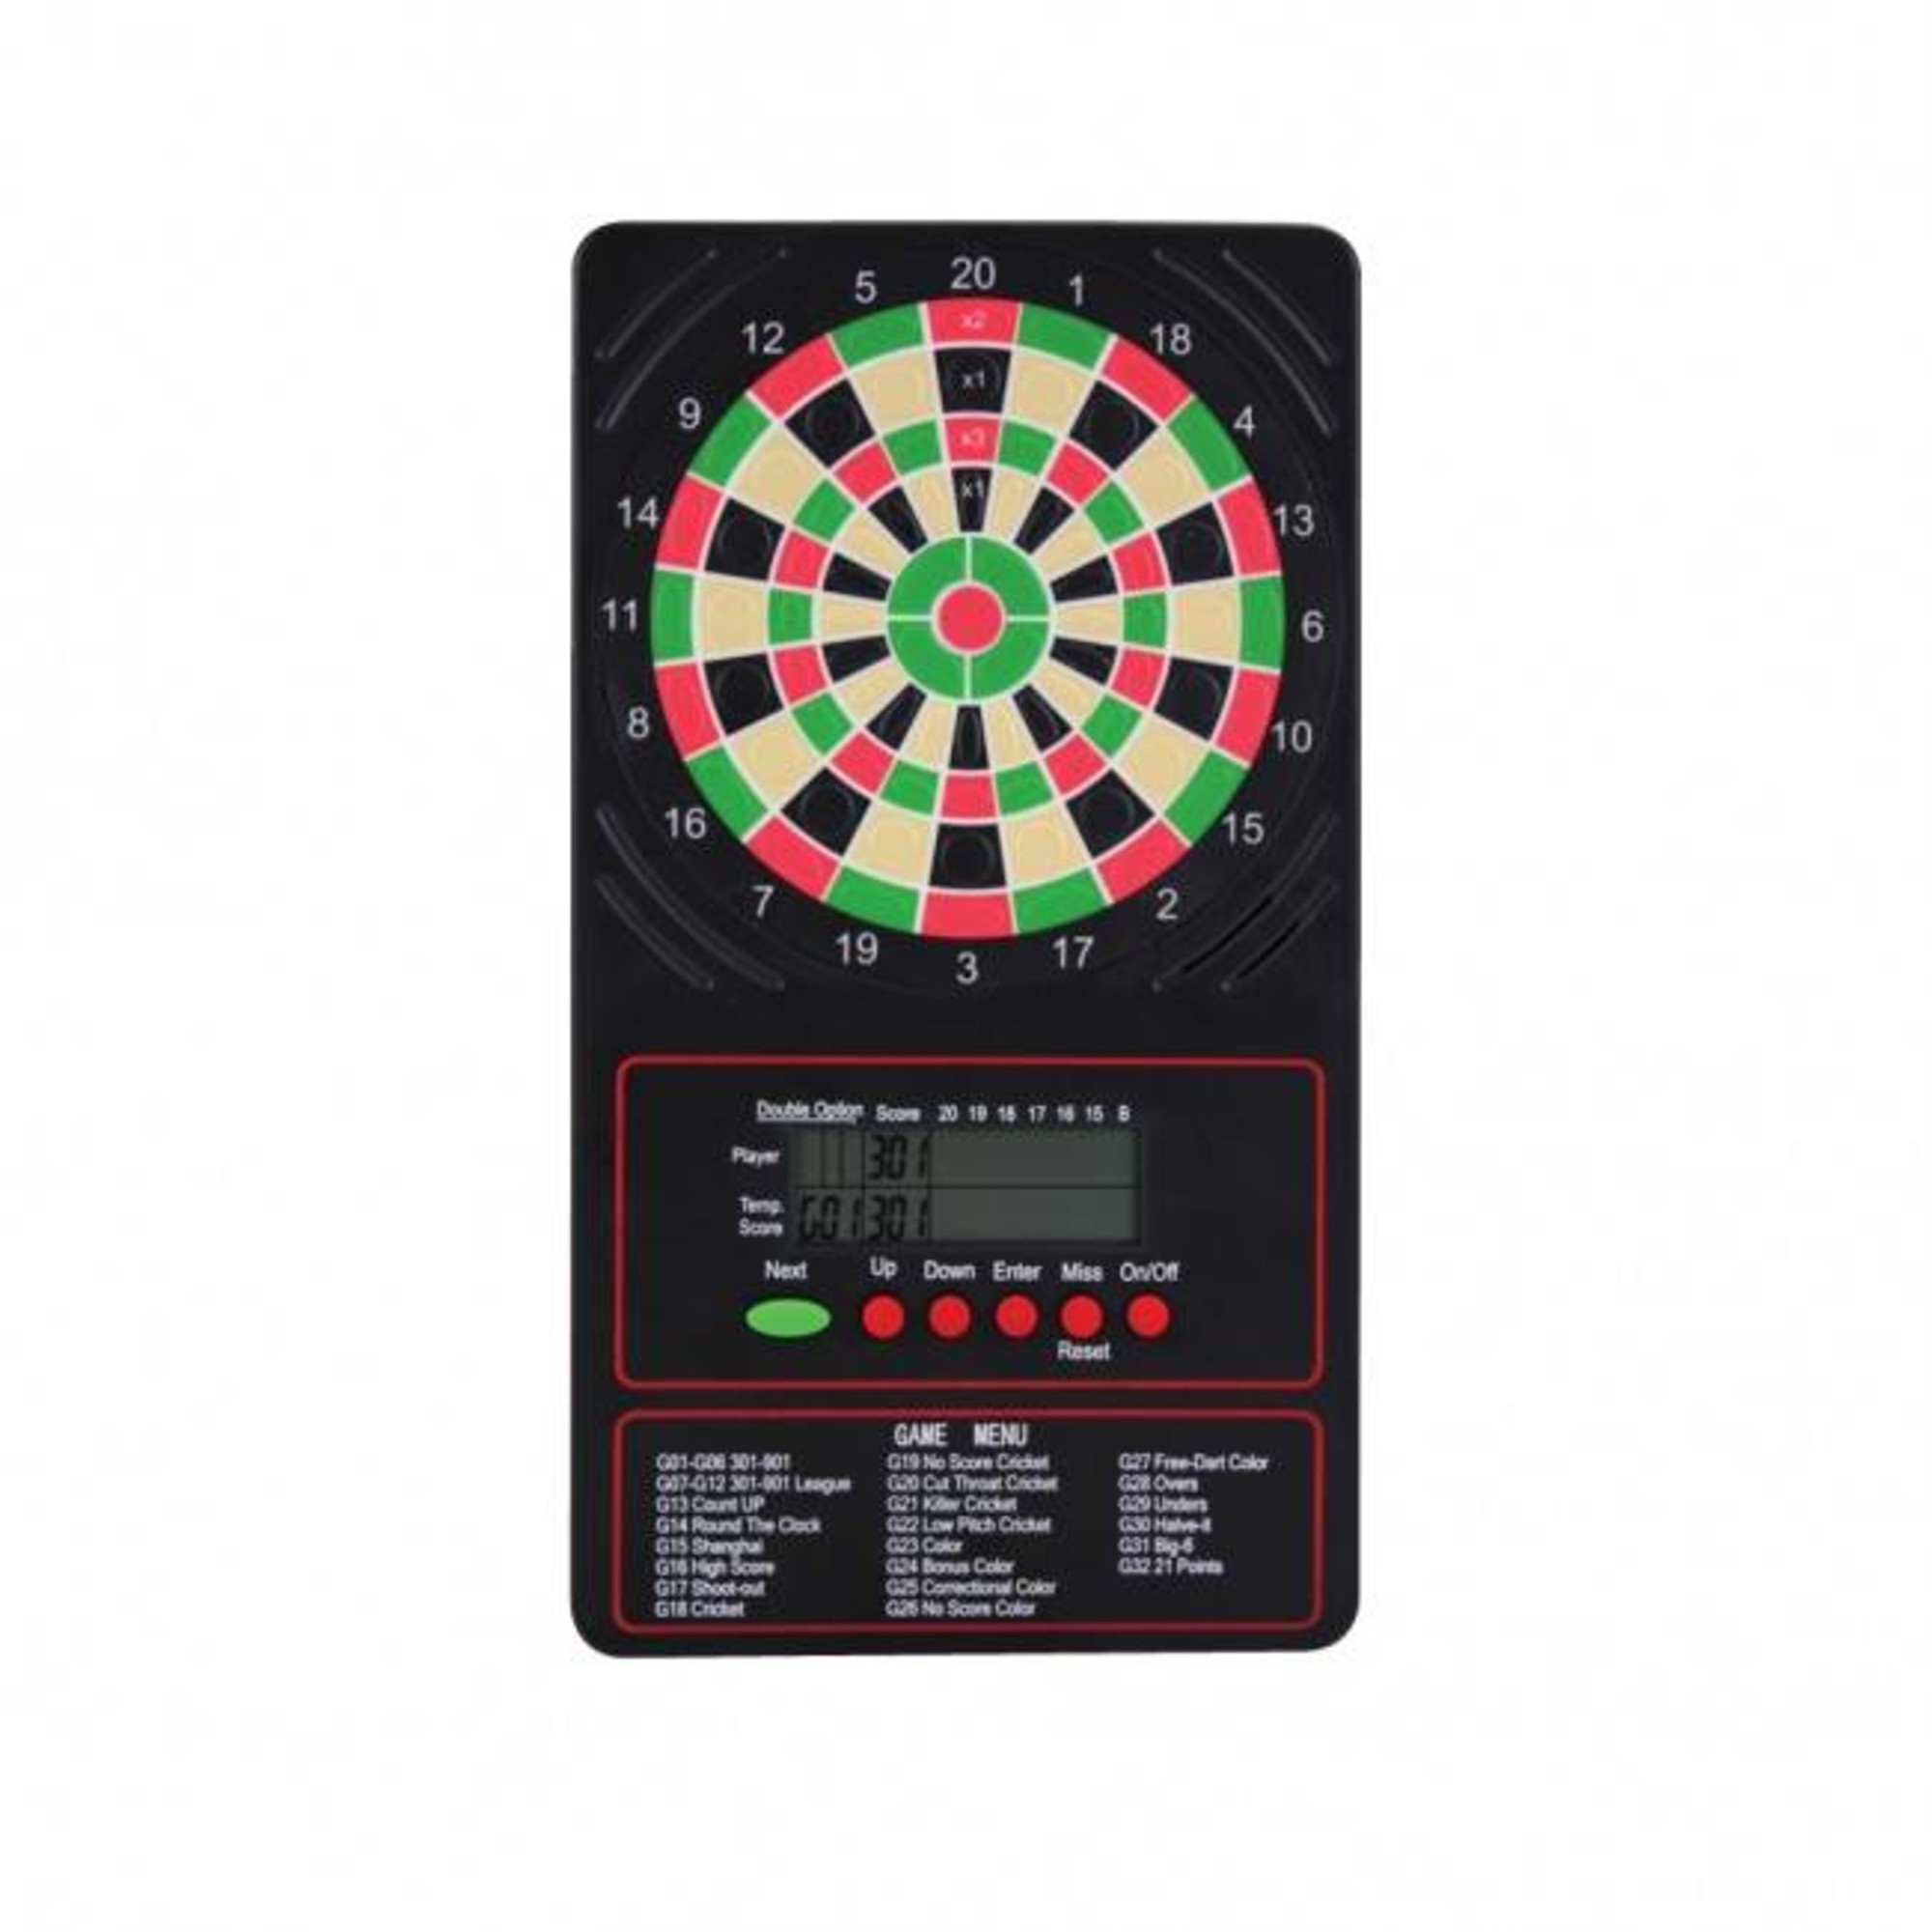 Winmau Darts Winmau Ton Machine Touchpad Scorer 2